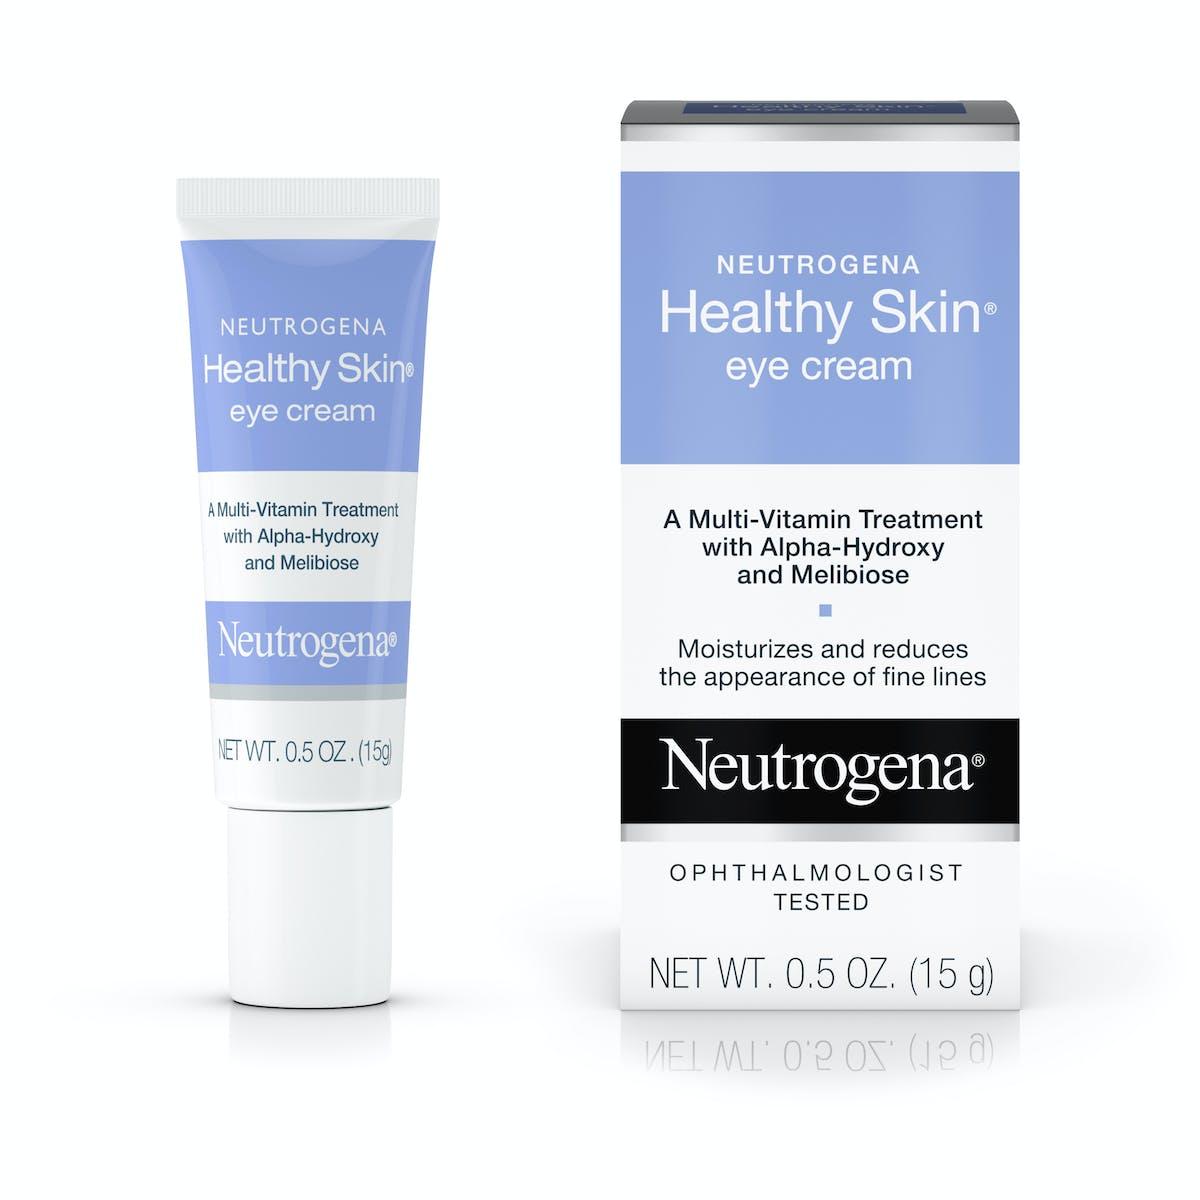 Healthy Skin Anti Aging Eye Cream Neutrogena